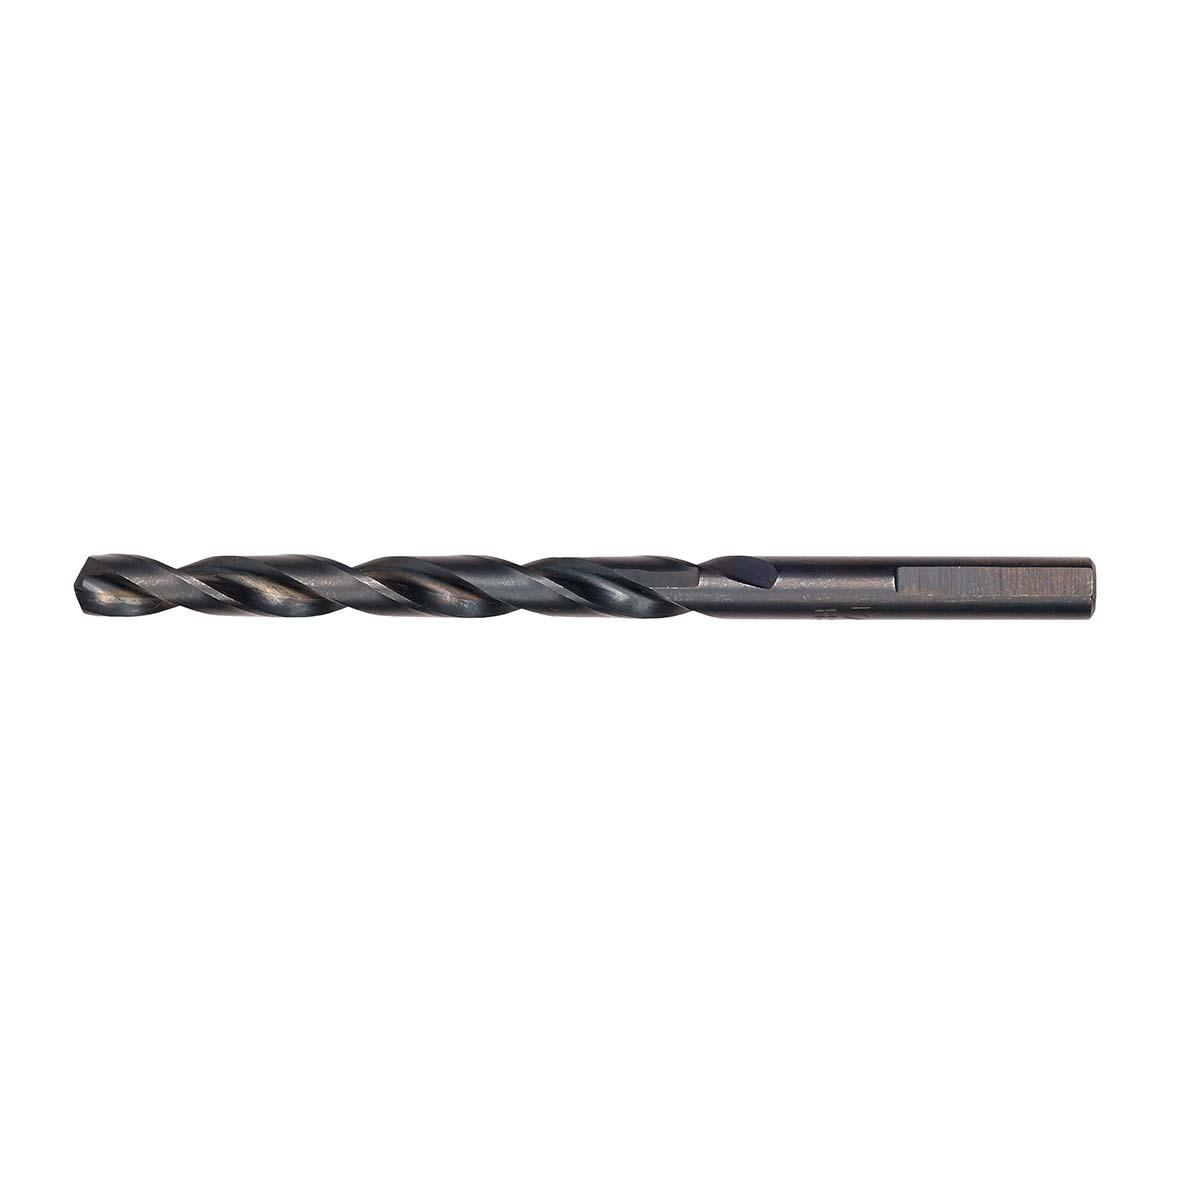 "17/64"" Thunderbolt®  Black Oxide Drill Bit"